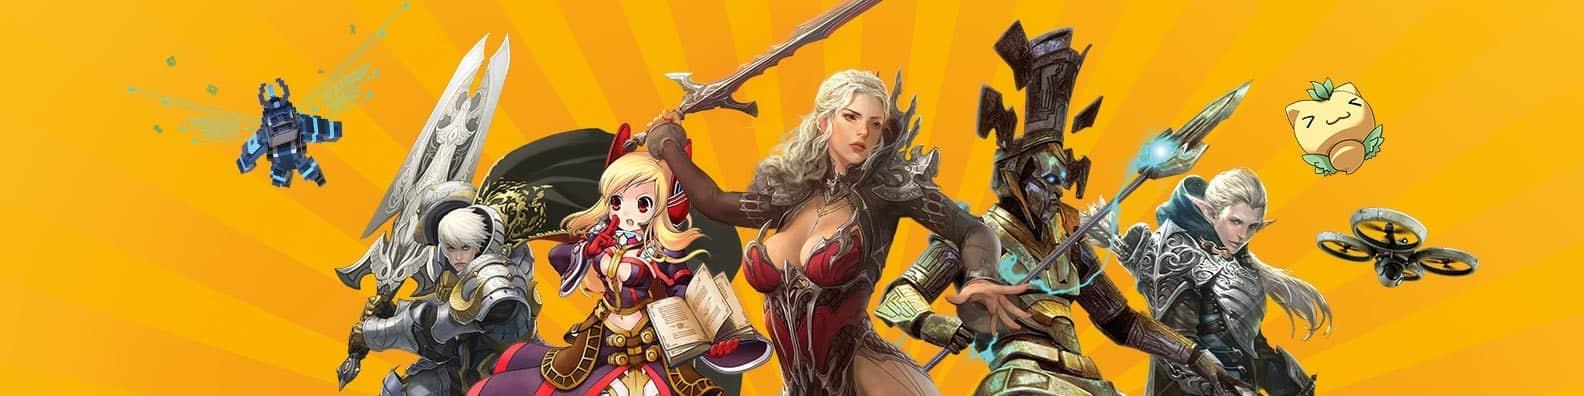 Gamigo Shuts Down Defiance, Defiance 2050, Eden Eternal, and Twin Saga 3